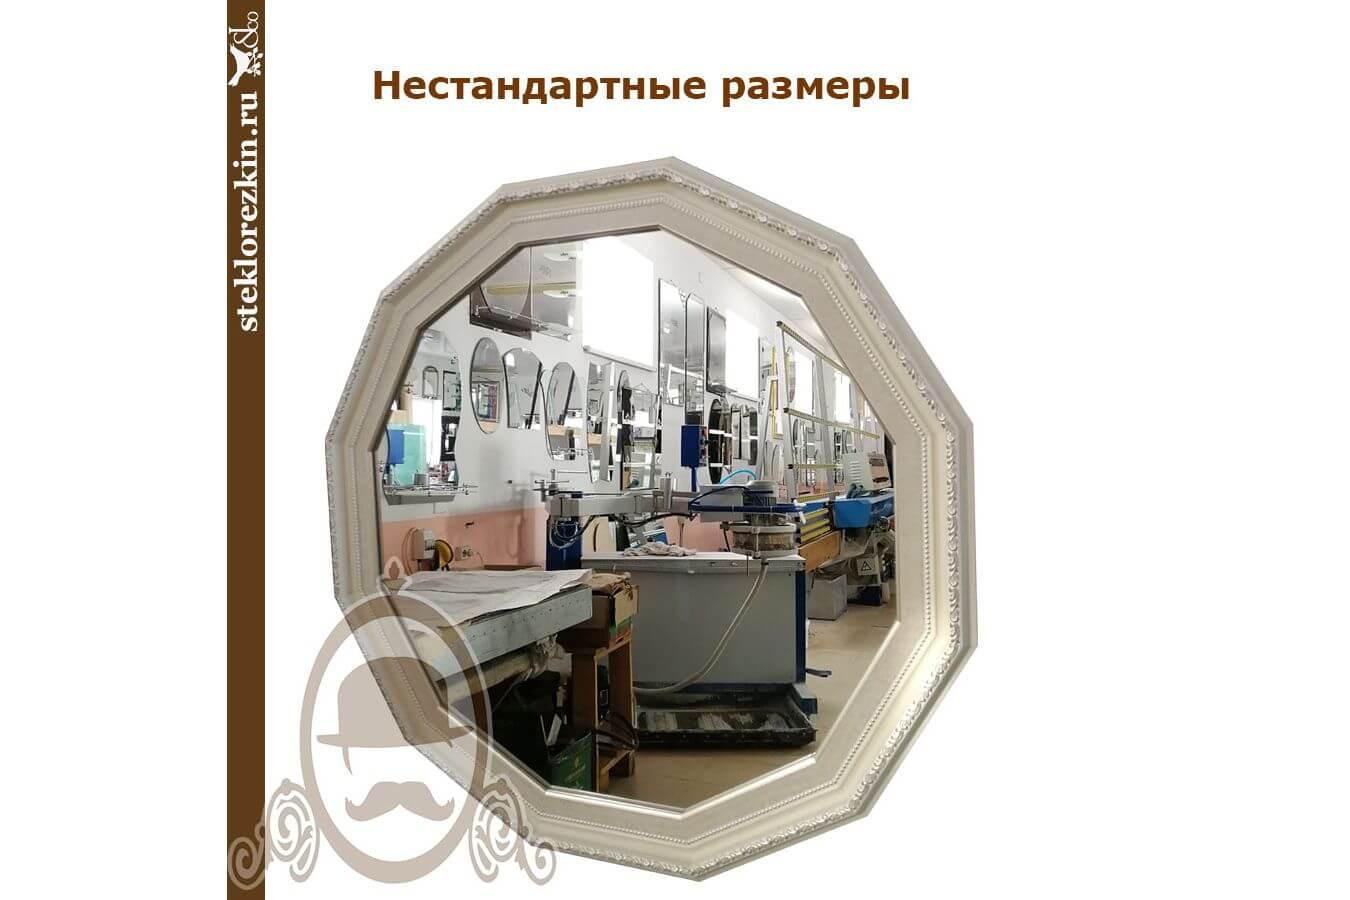 Baget_steklorezkin.ru_baget-zamer5.jpg